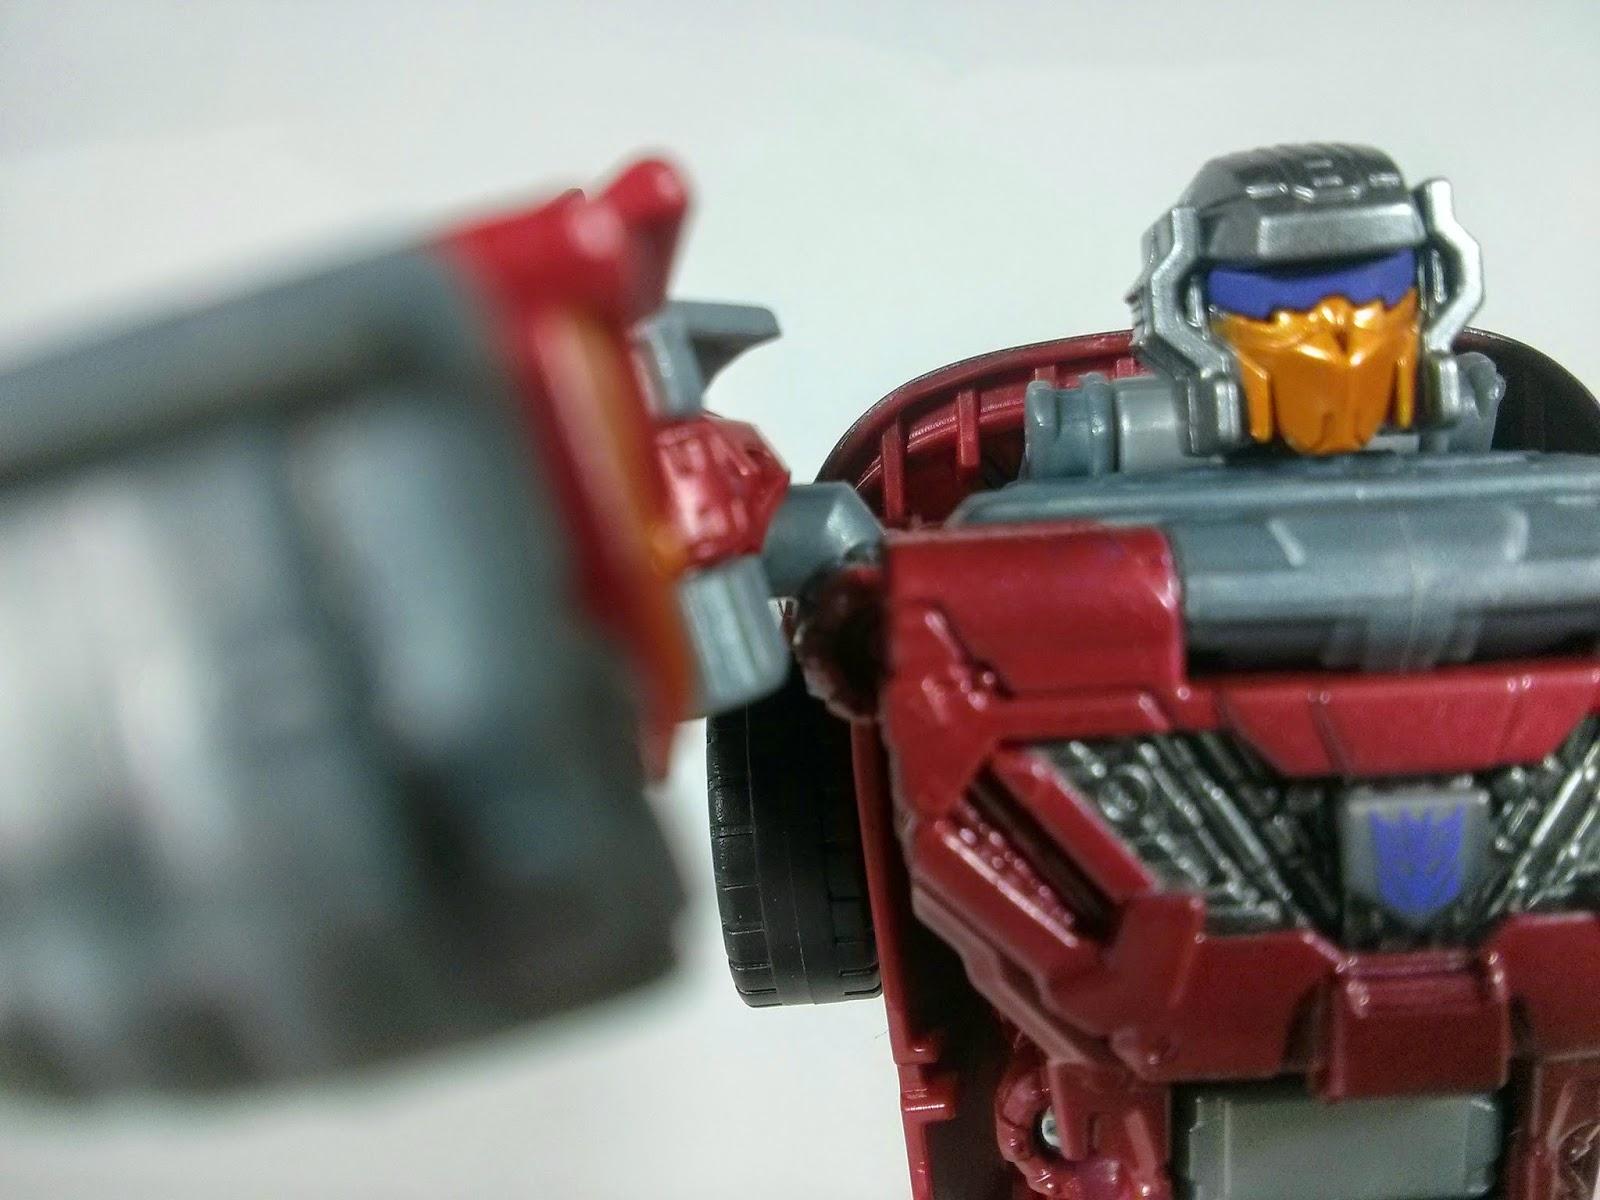 Transformers Dead Ends head